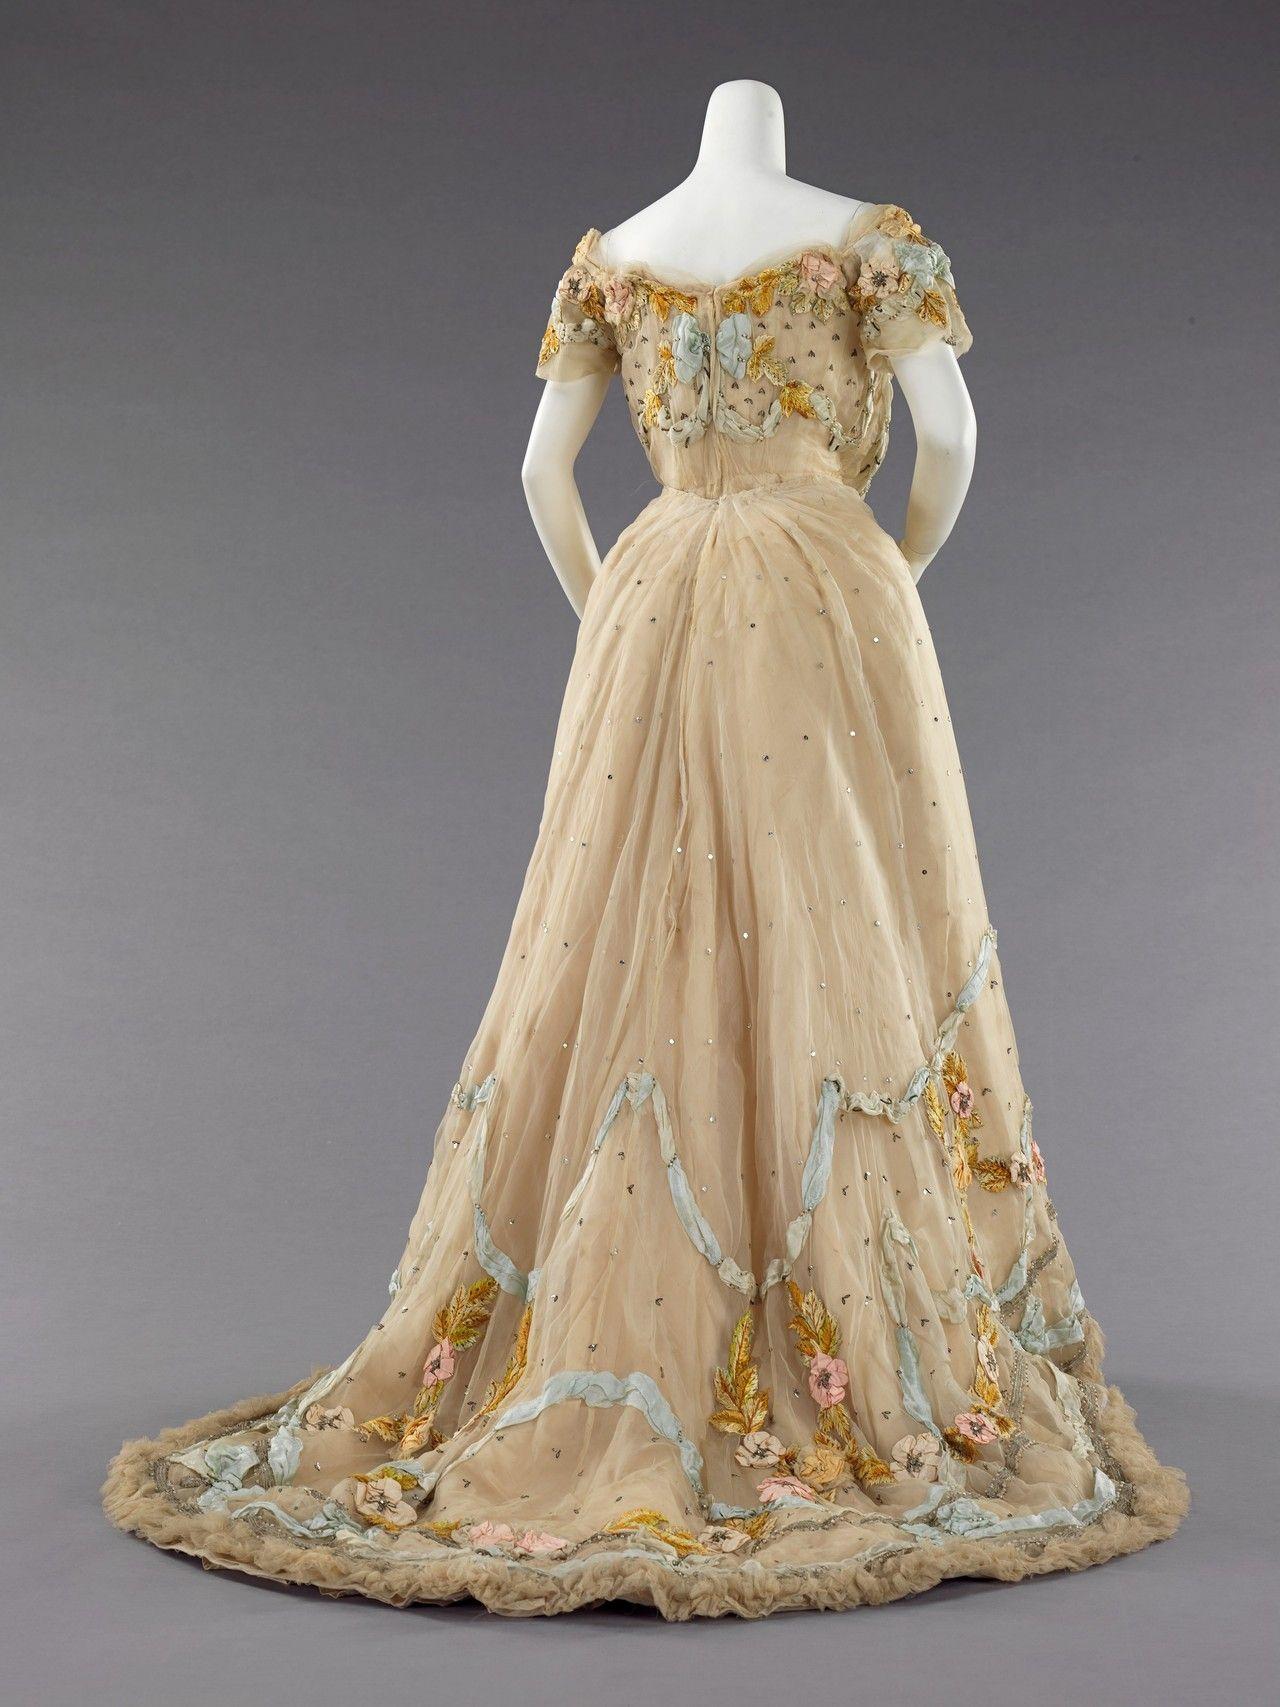 Ball gown doucet ca fashion history história da moda